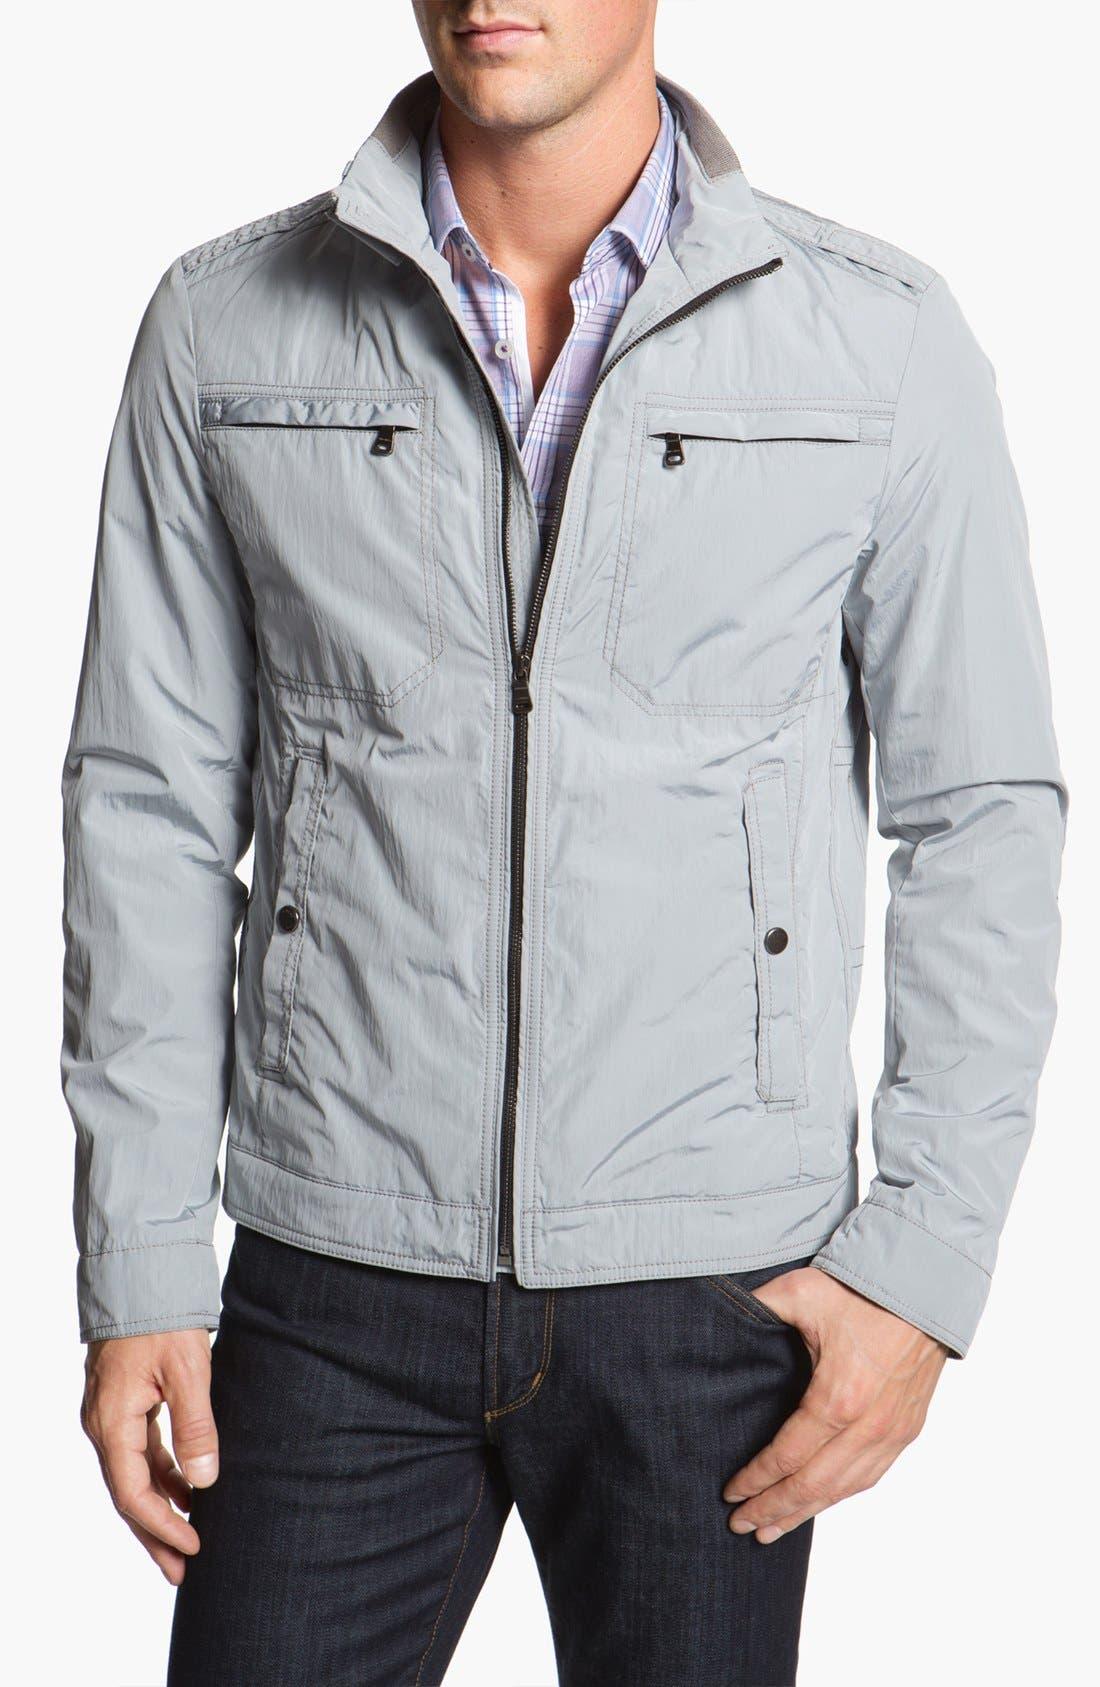 Alternate Image 1 Selected - BOSS Black 'Capontz' Crinkle Techno Jacket